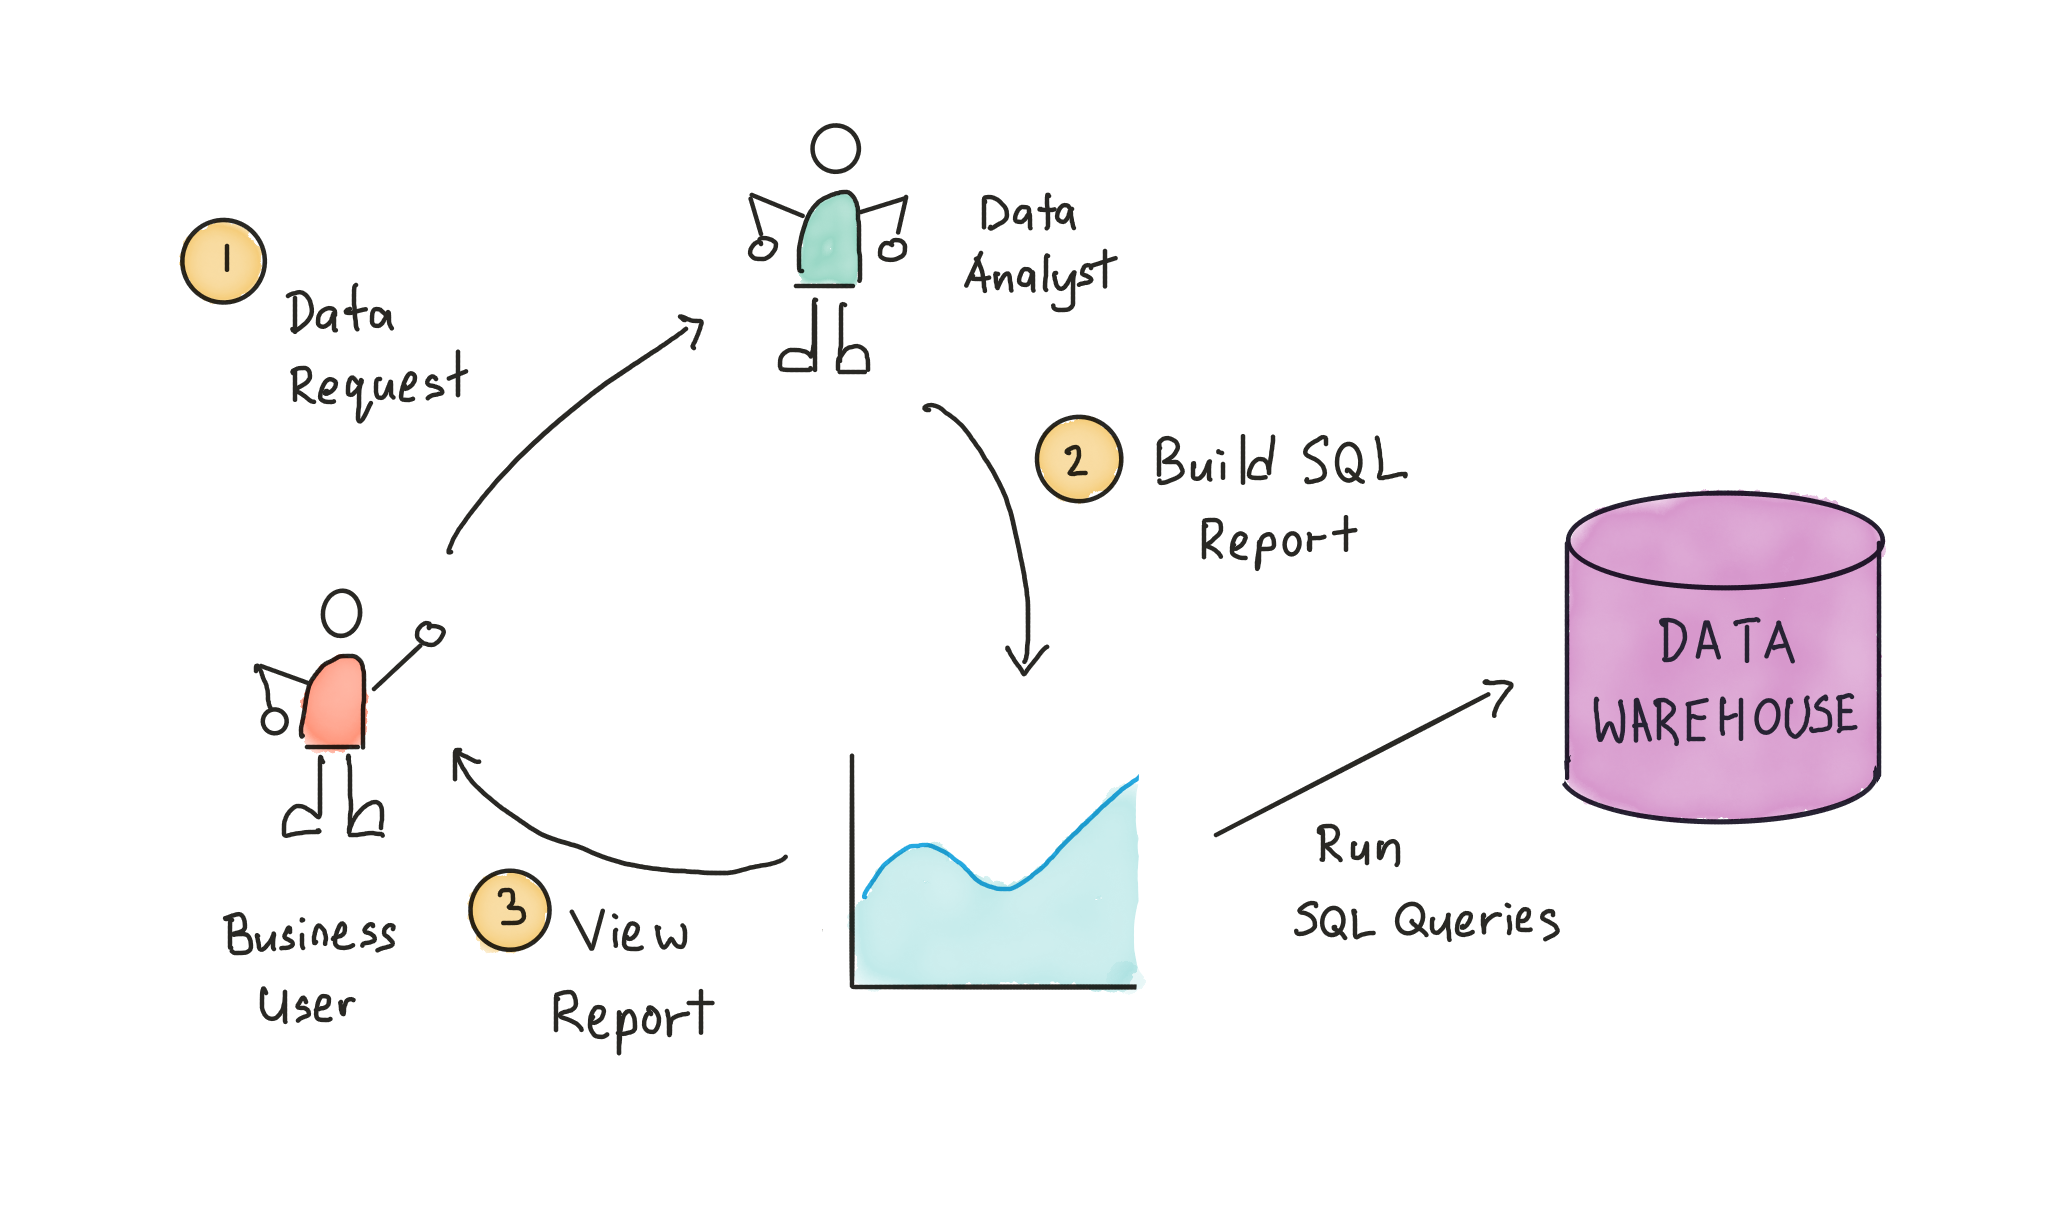 Static report/dashboard